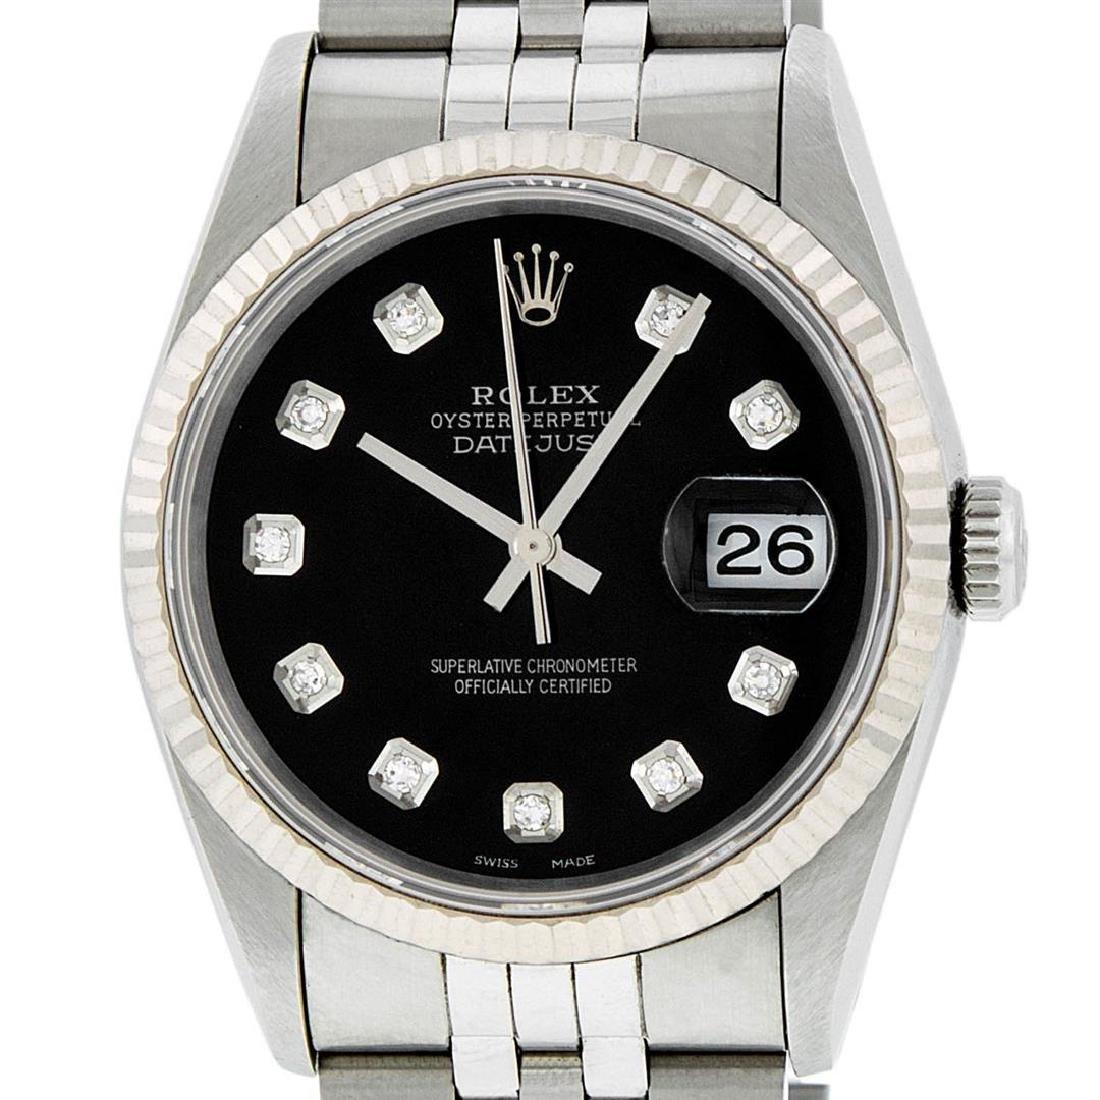 Rolex Mens SS Black Diamond Datejust Quickset Sapphire